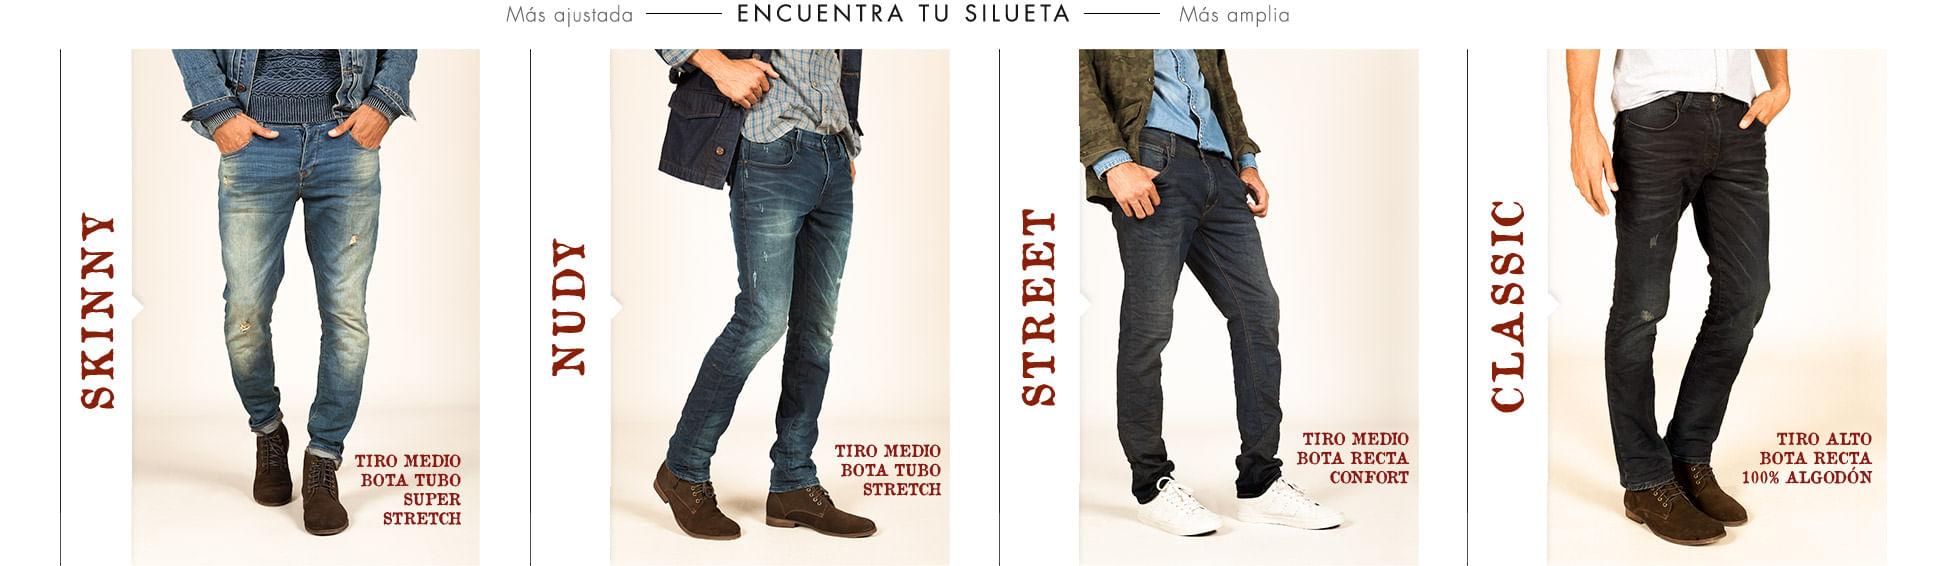 Siluetas de jeans para hombre